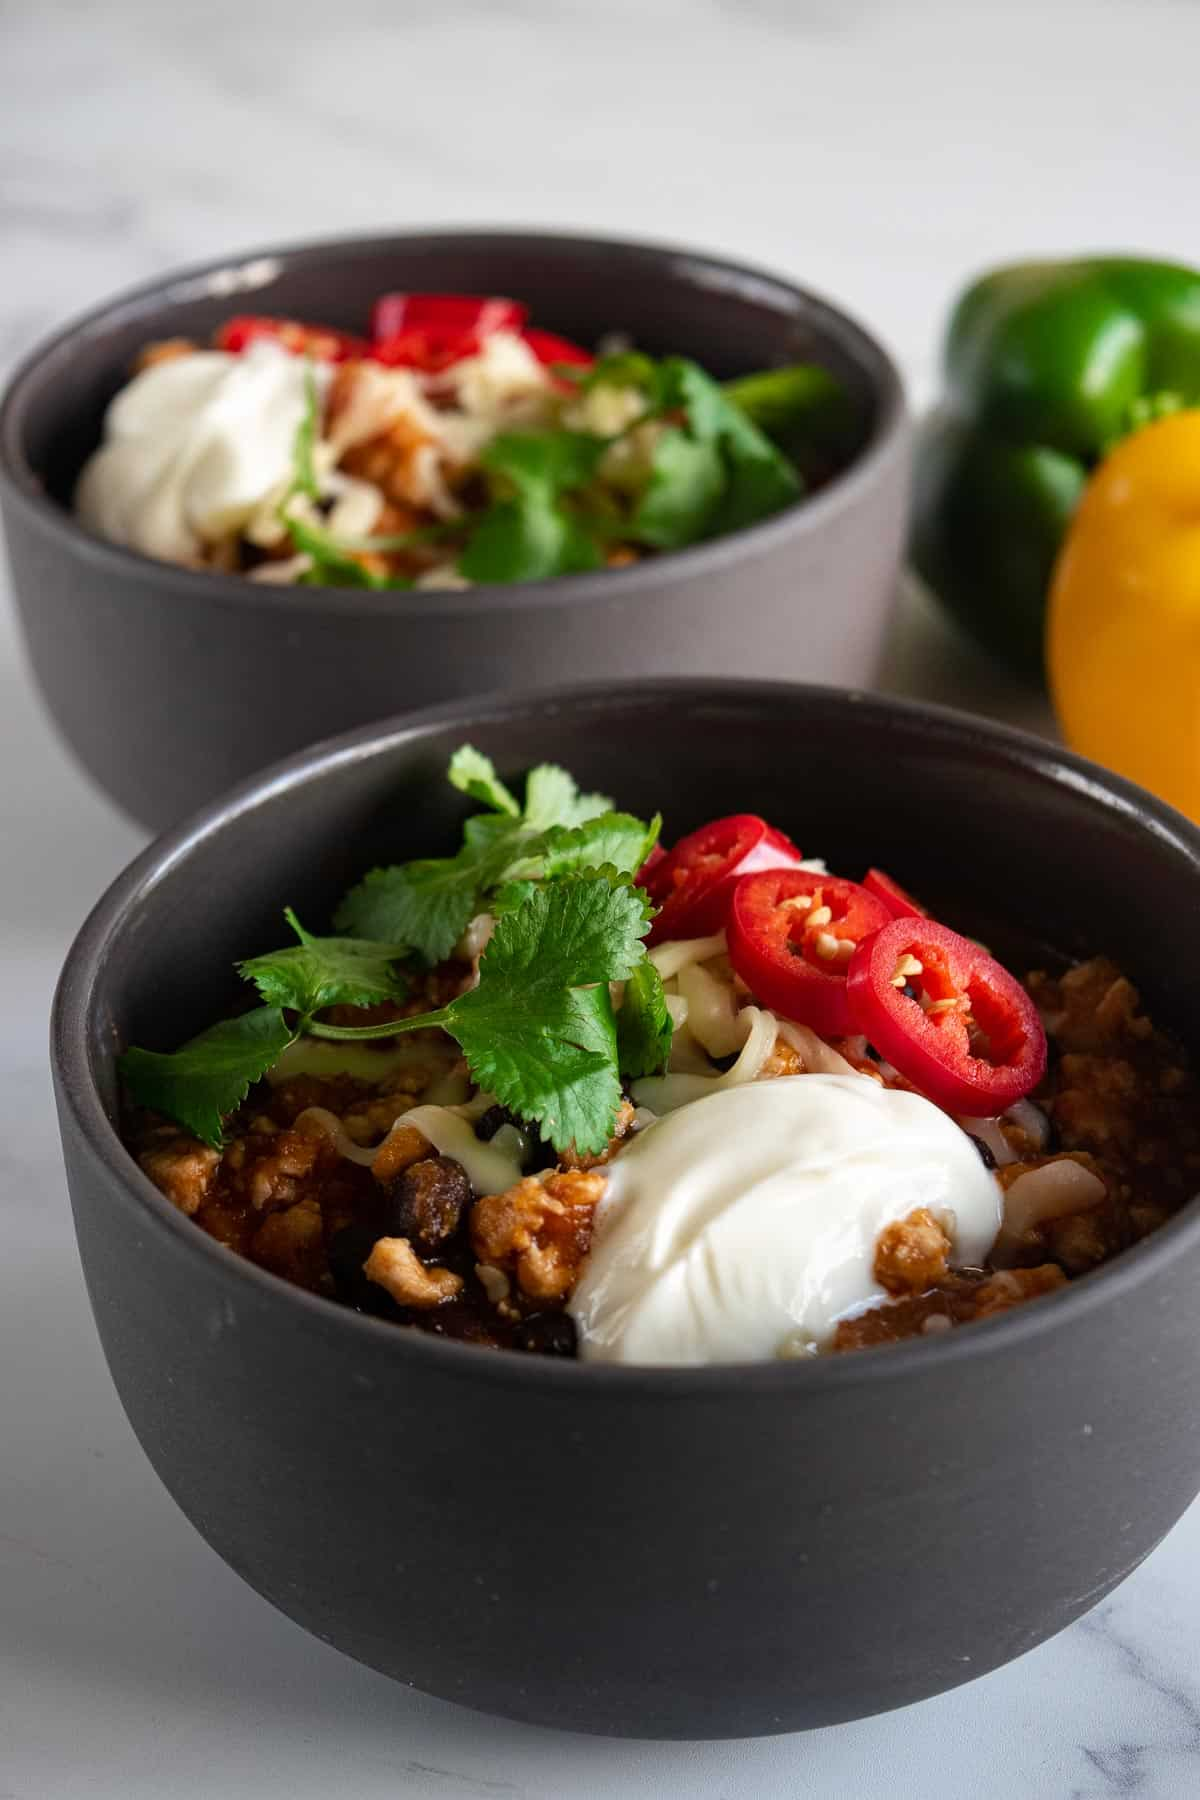 Two bowls of turkey sweet potato chili topped with chili, cilantro and yogurt.